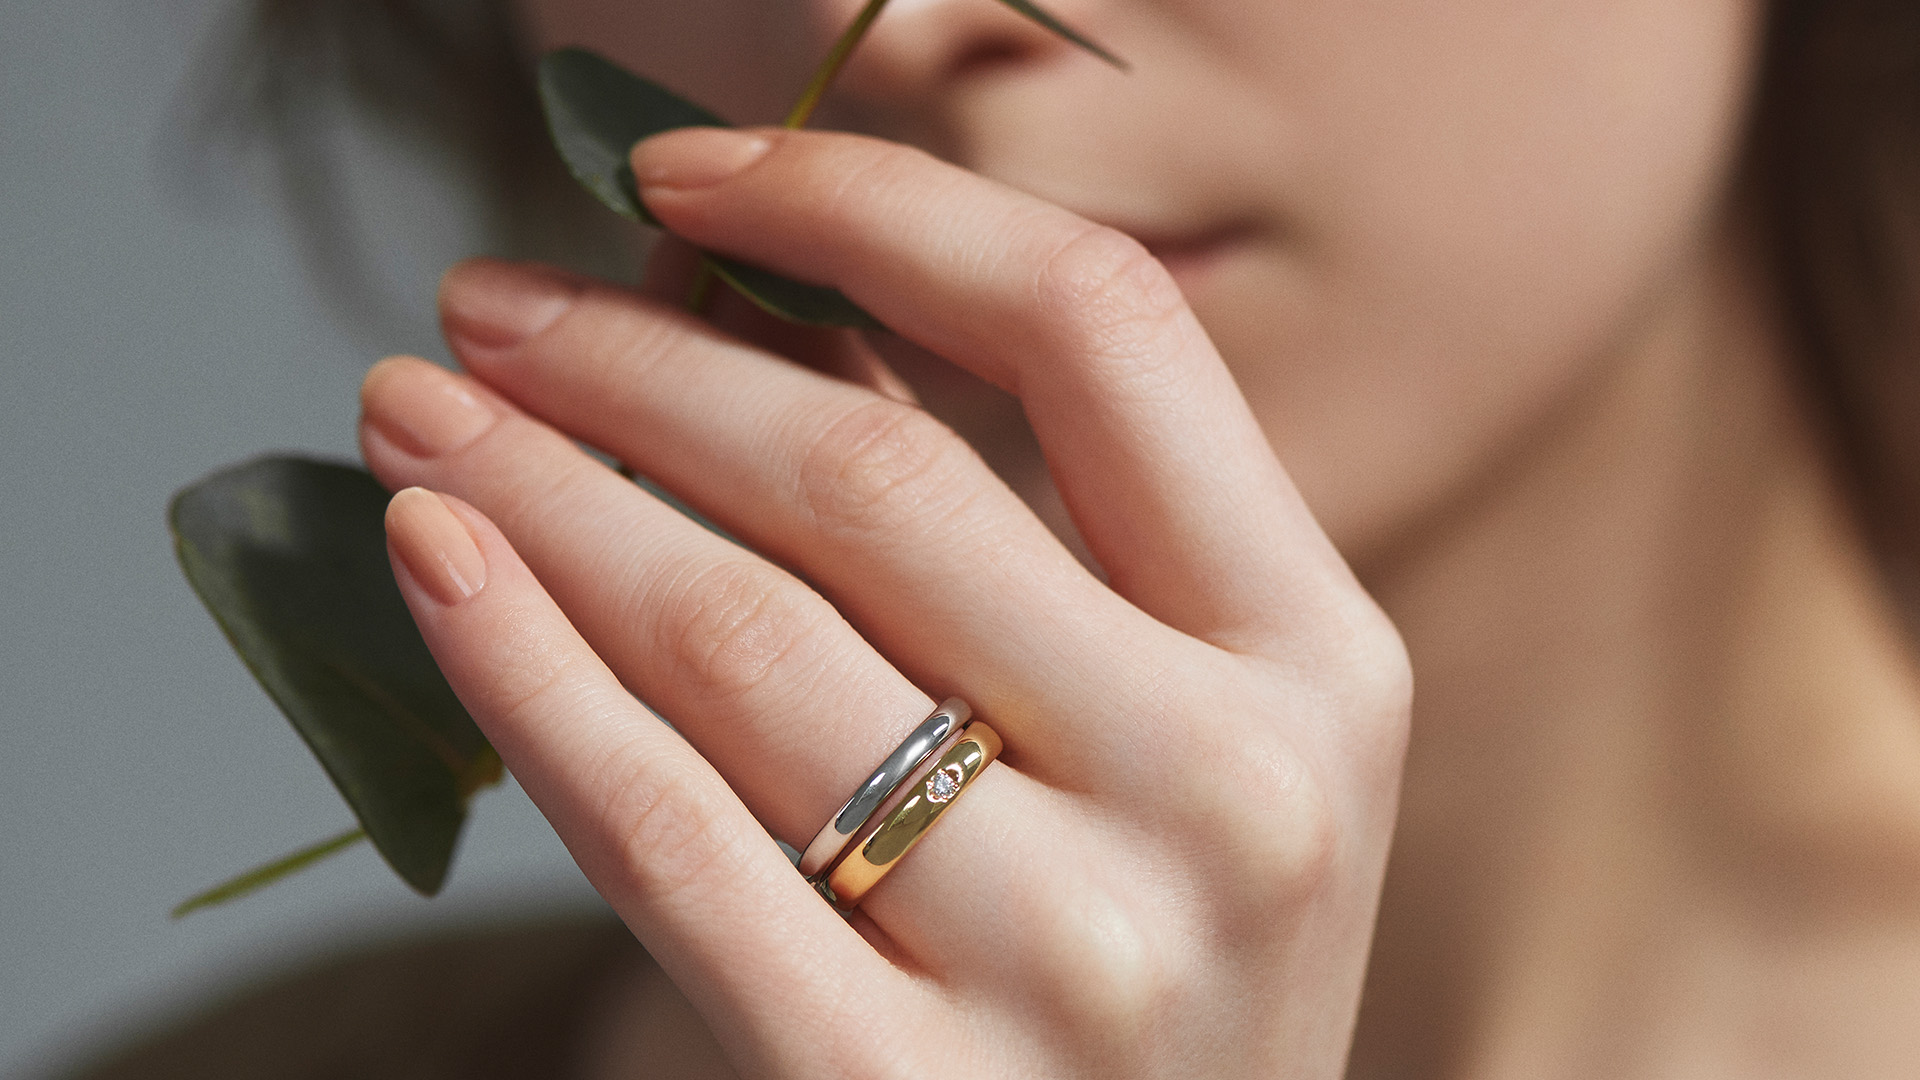 Origin Belief01 オリジンビリーフ01 | 結婚指輪サムネイル 4